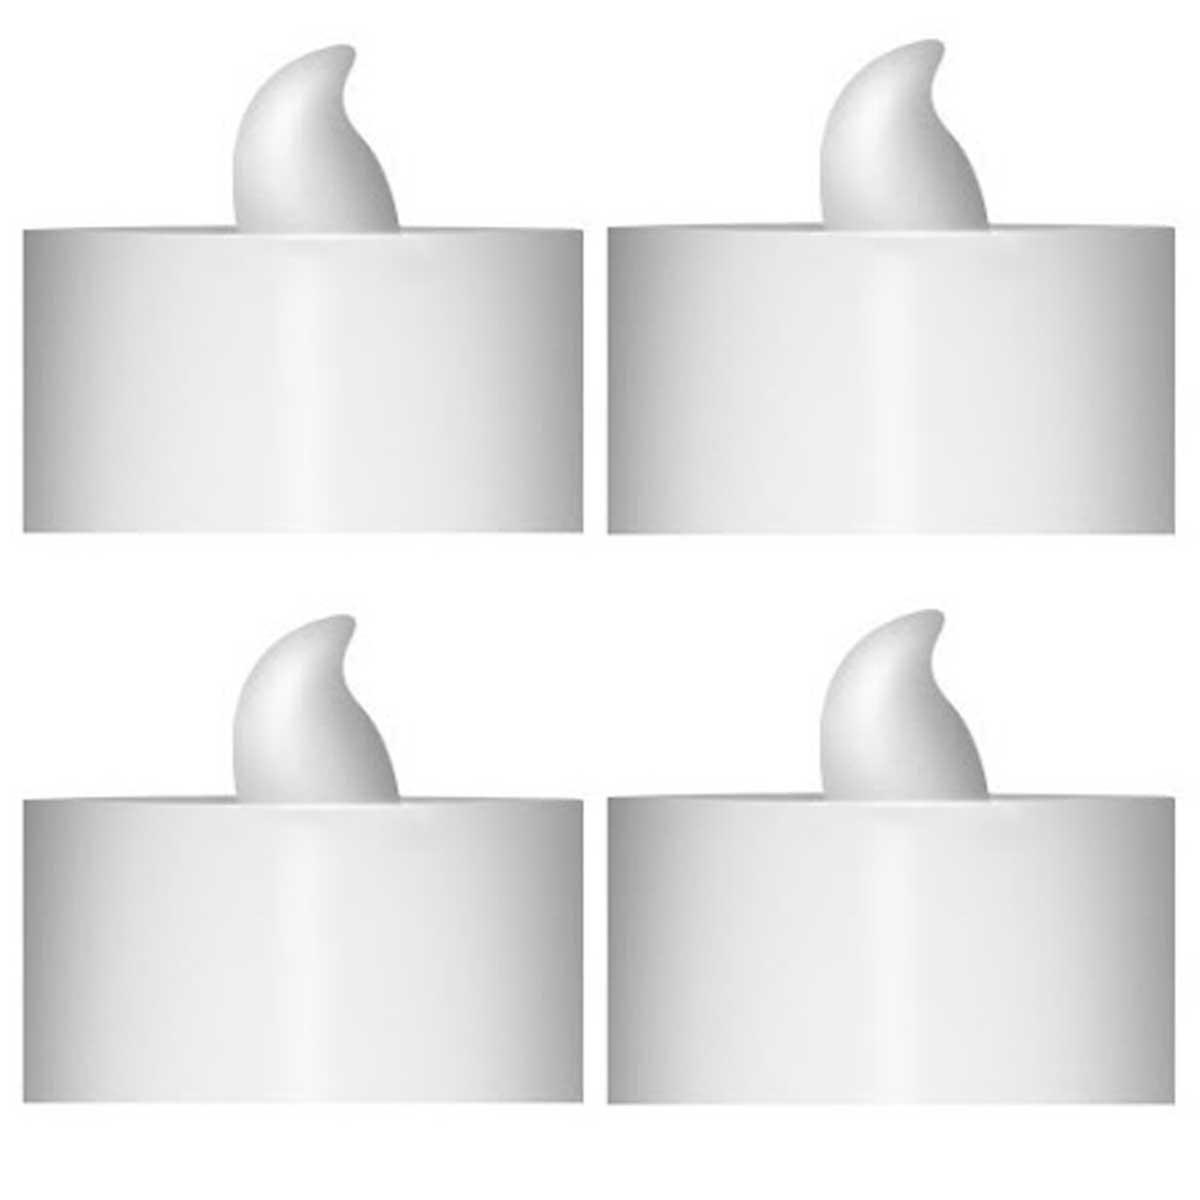 Kit de velas decorativas eletrônicas de LED 5cm 4 pçs Branca